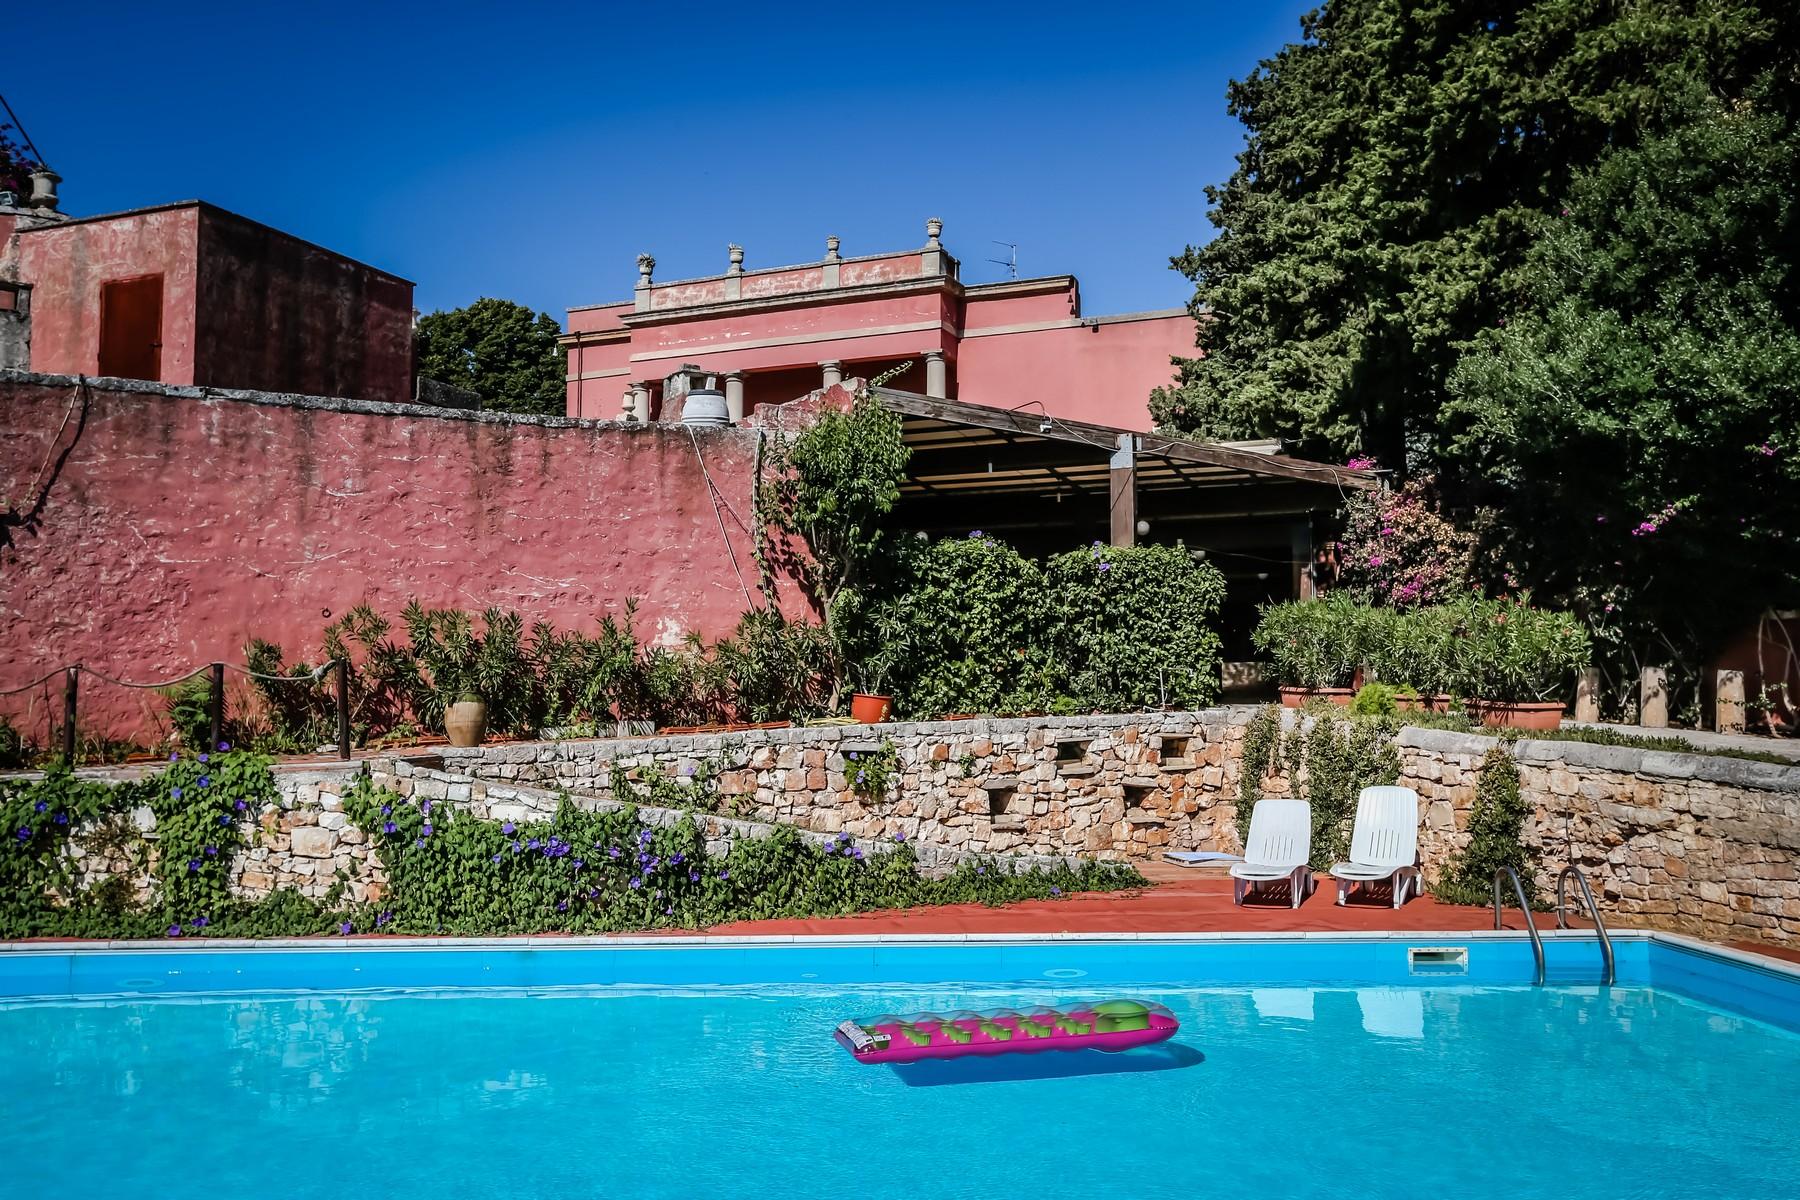 Additional photo for property listing at Villa Meo Evoli Contrada S. Oceano Monopoli, Bari 70043 Italy